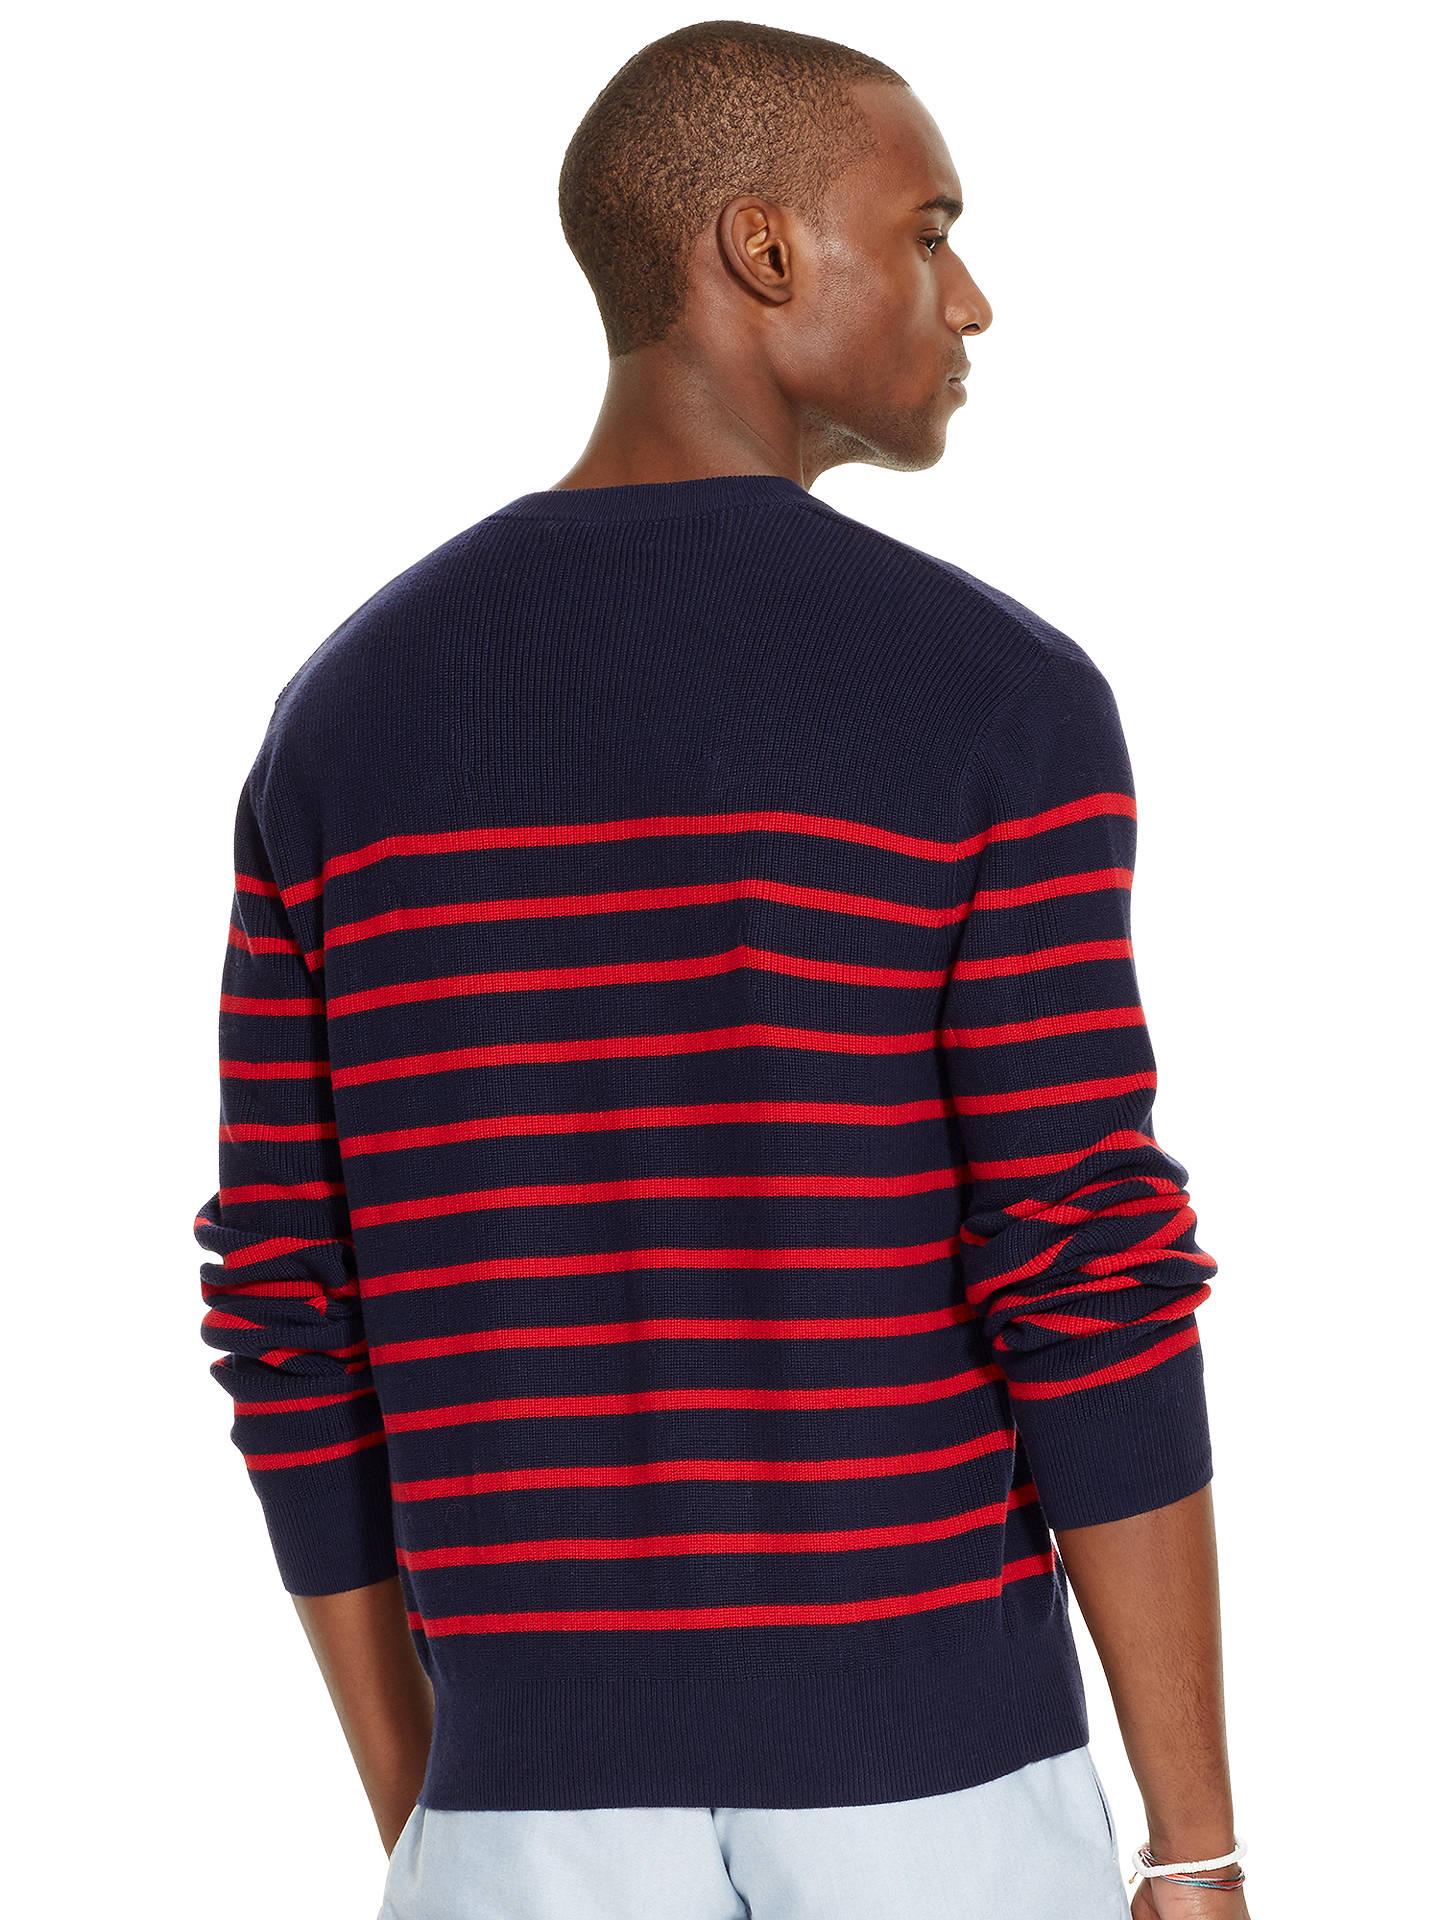 ... BuyPolo Ralph Lauren Stripe Sweater, Navy/Red, S Online at  johnlewis.com ...